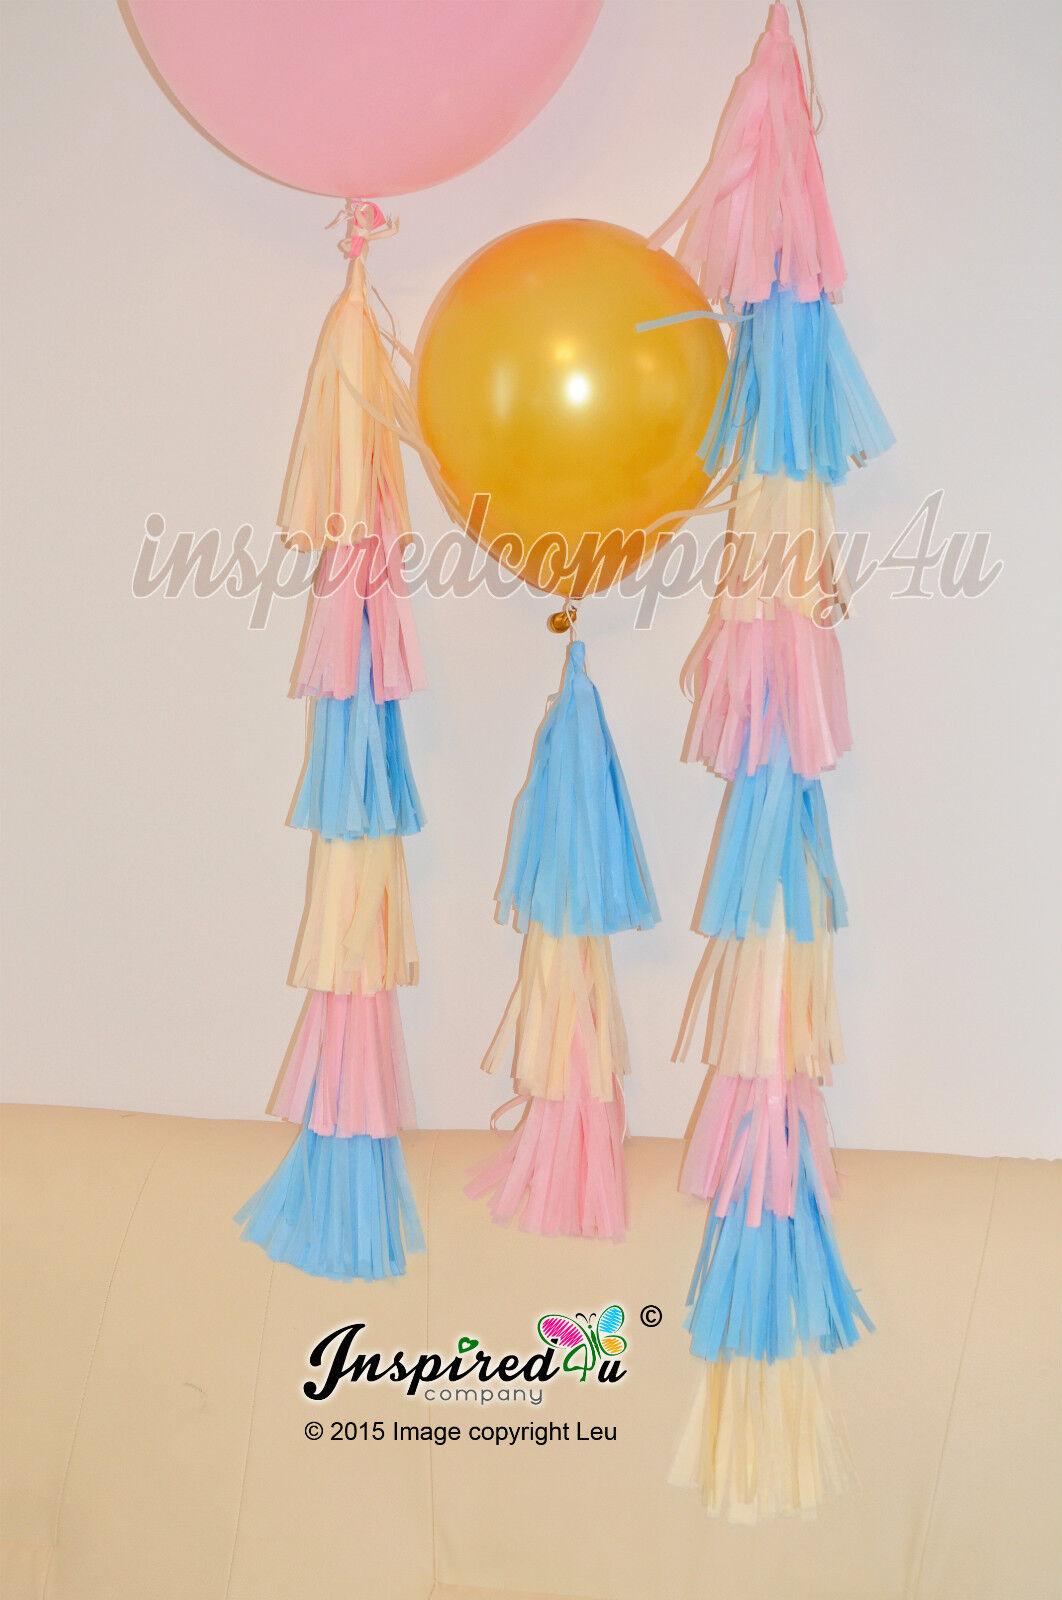 Trio 3 x rose ballon main tassel guirlande baby shower anniversaire fête de mariage 36